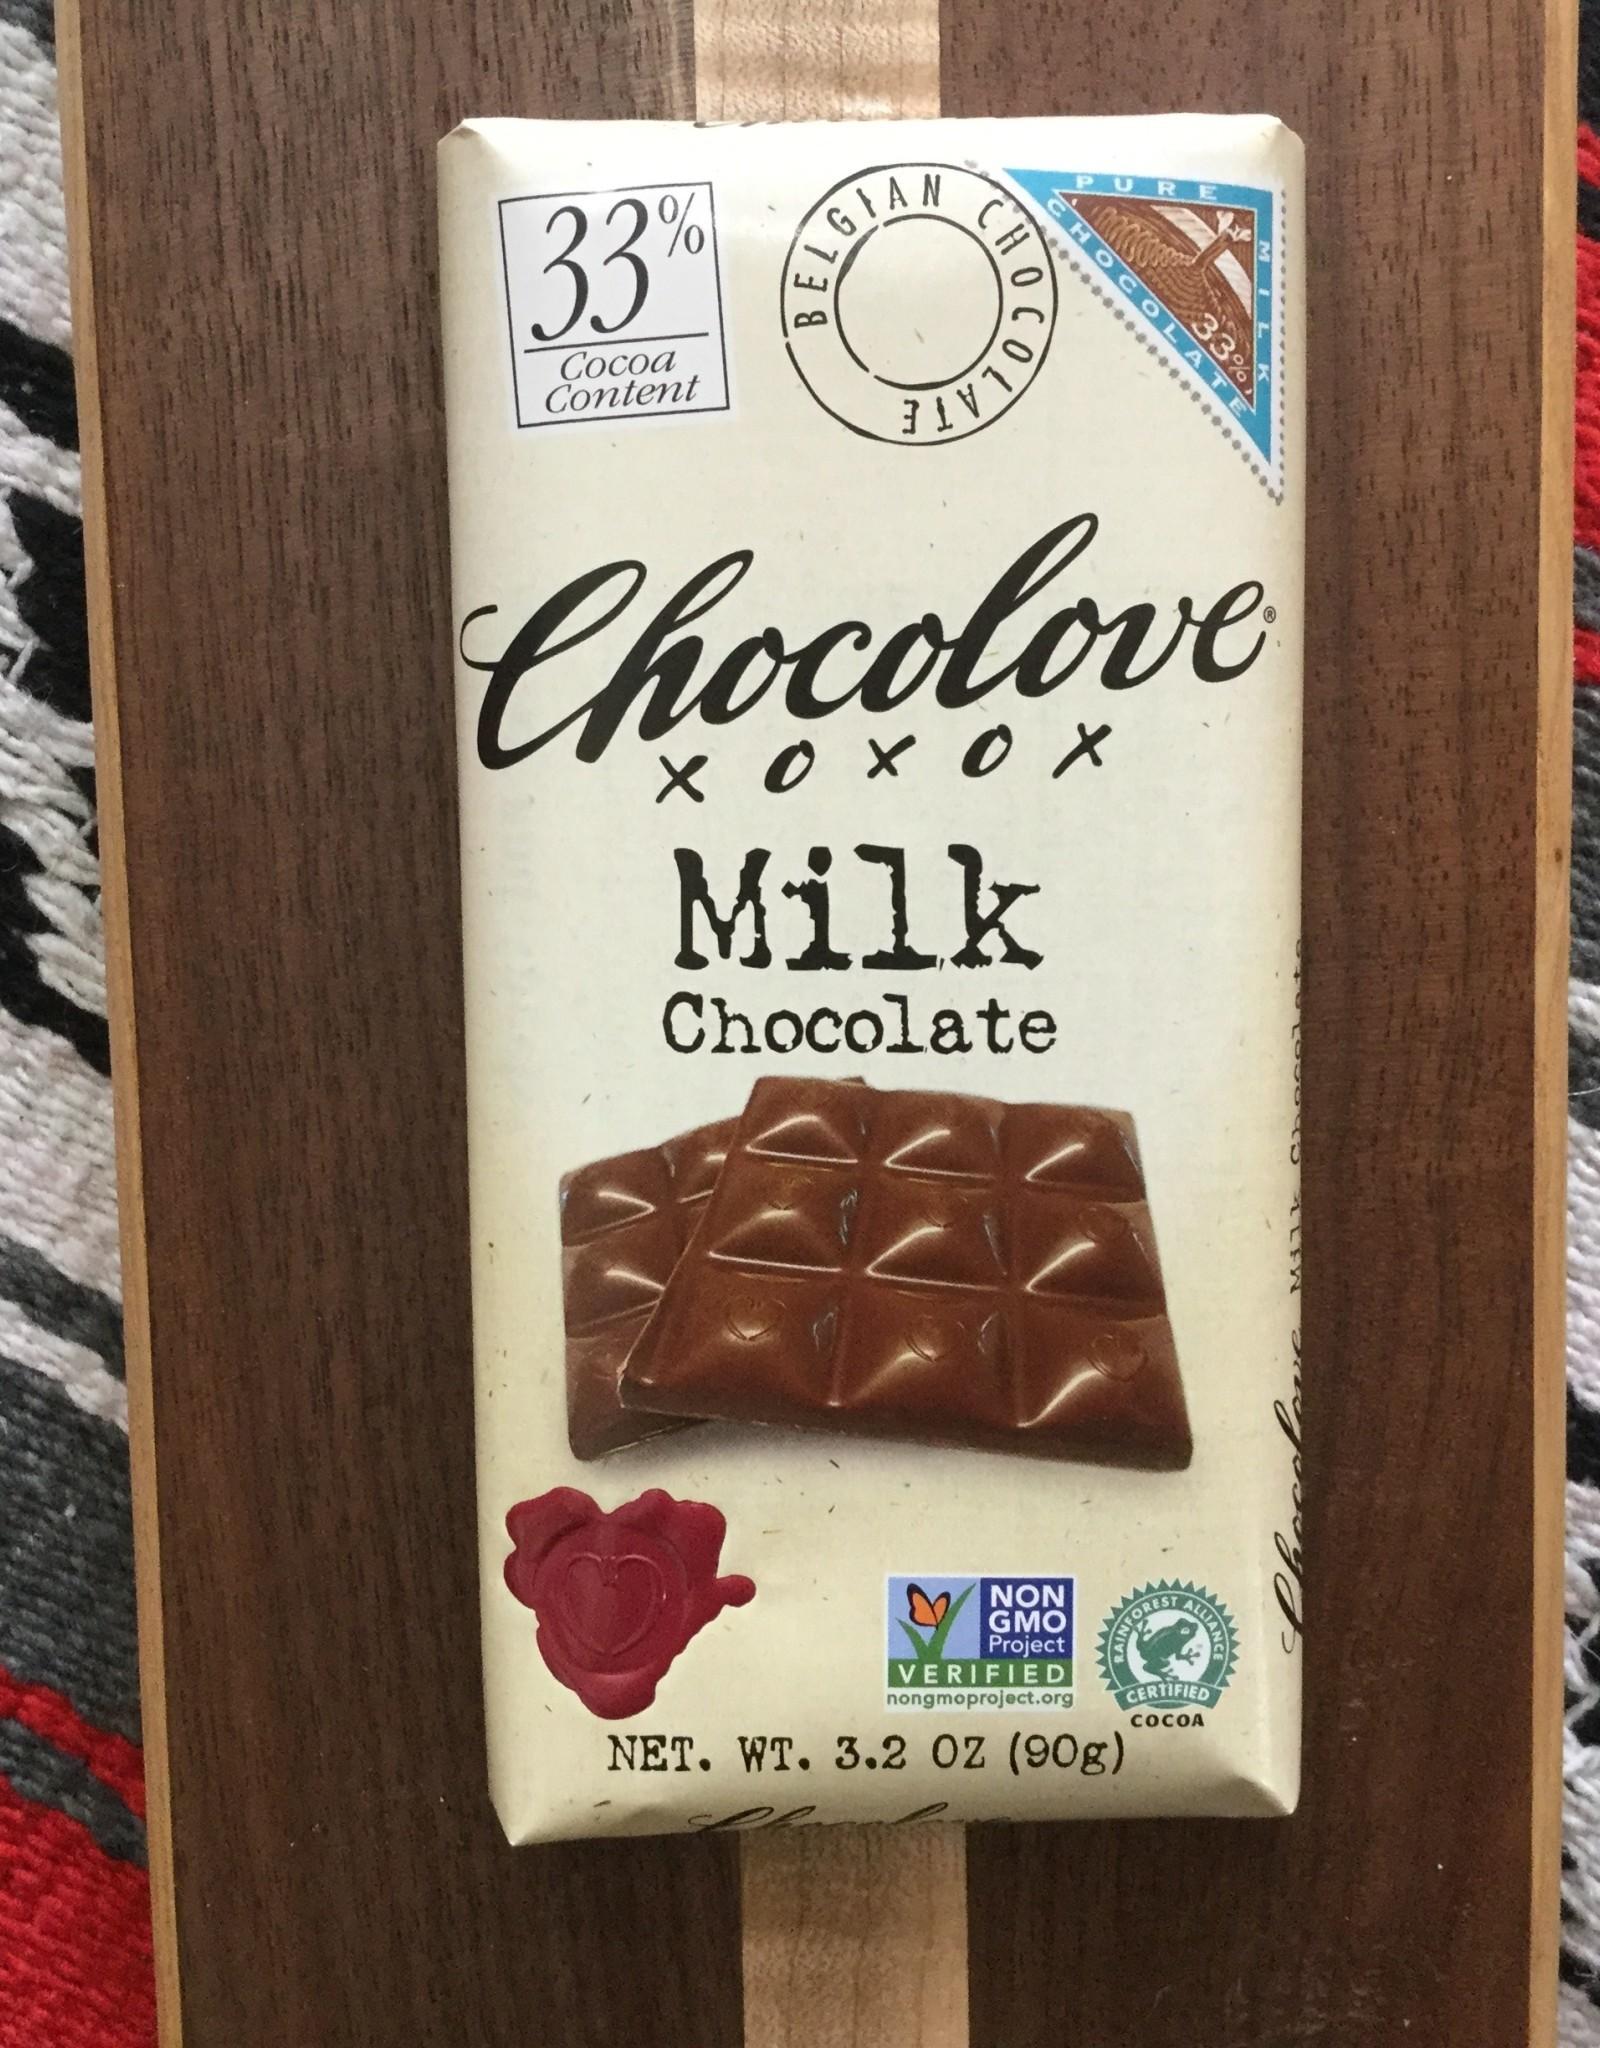 Chocolove Pure Milk Chocolate Bar 3.2 oz